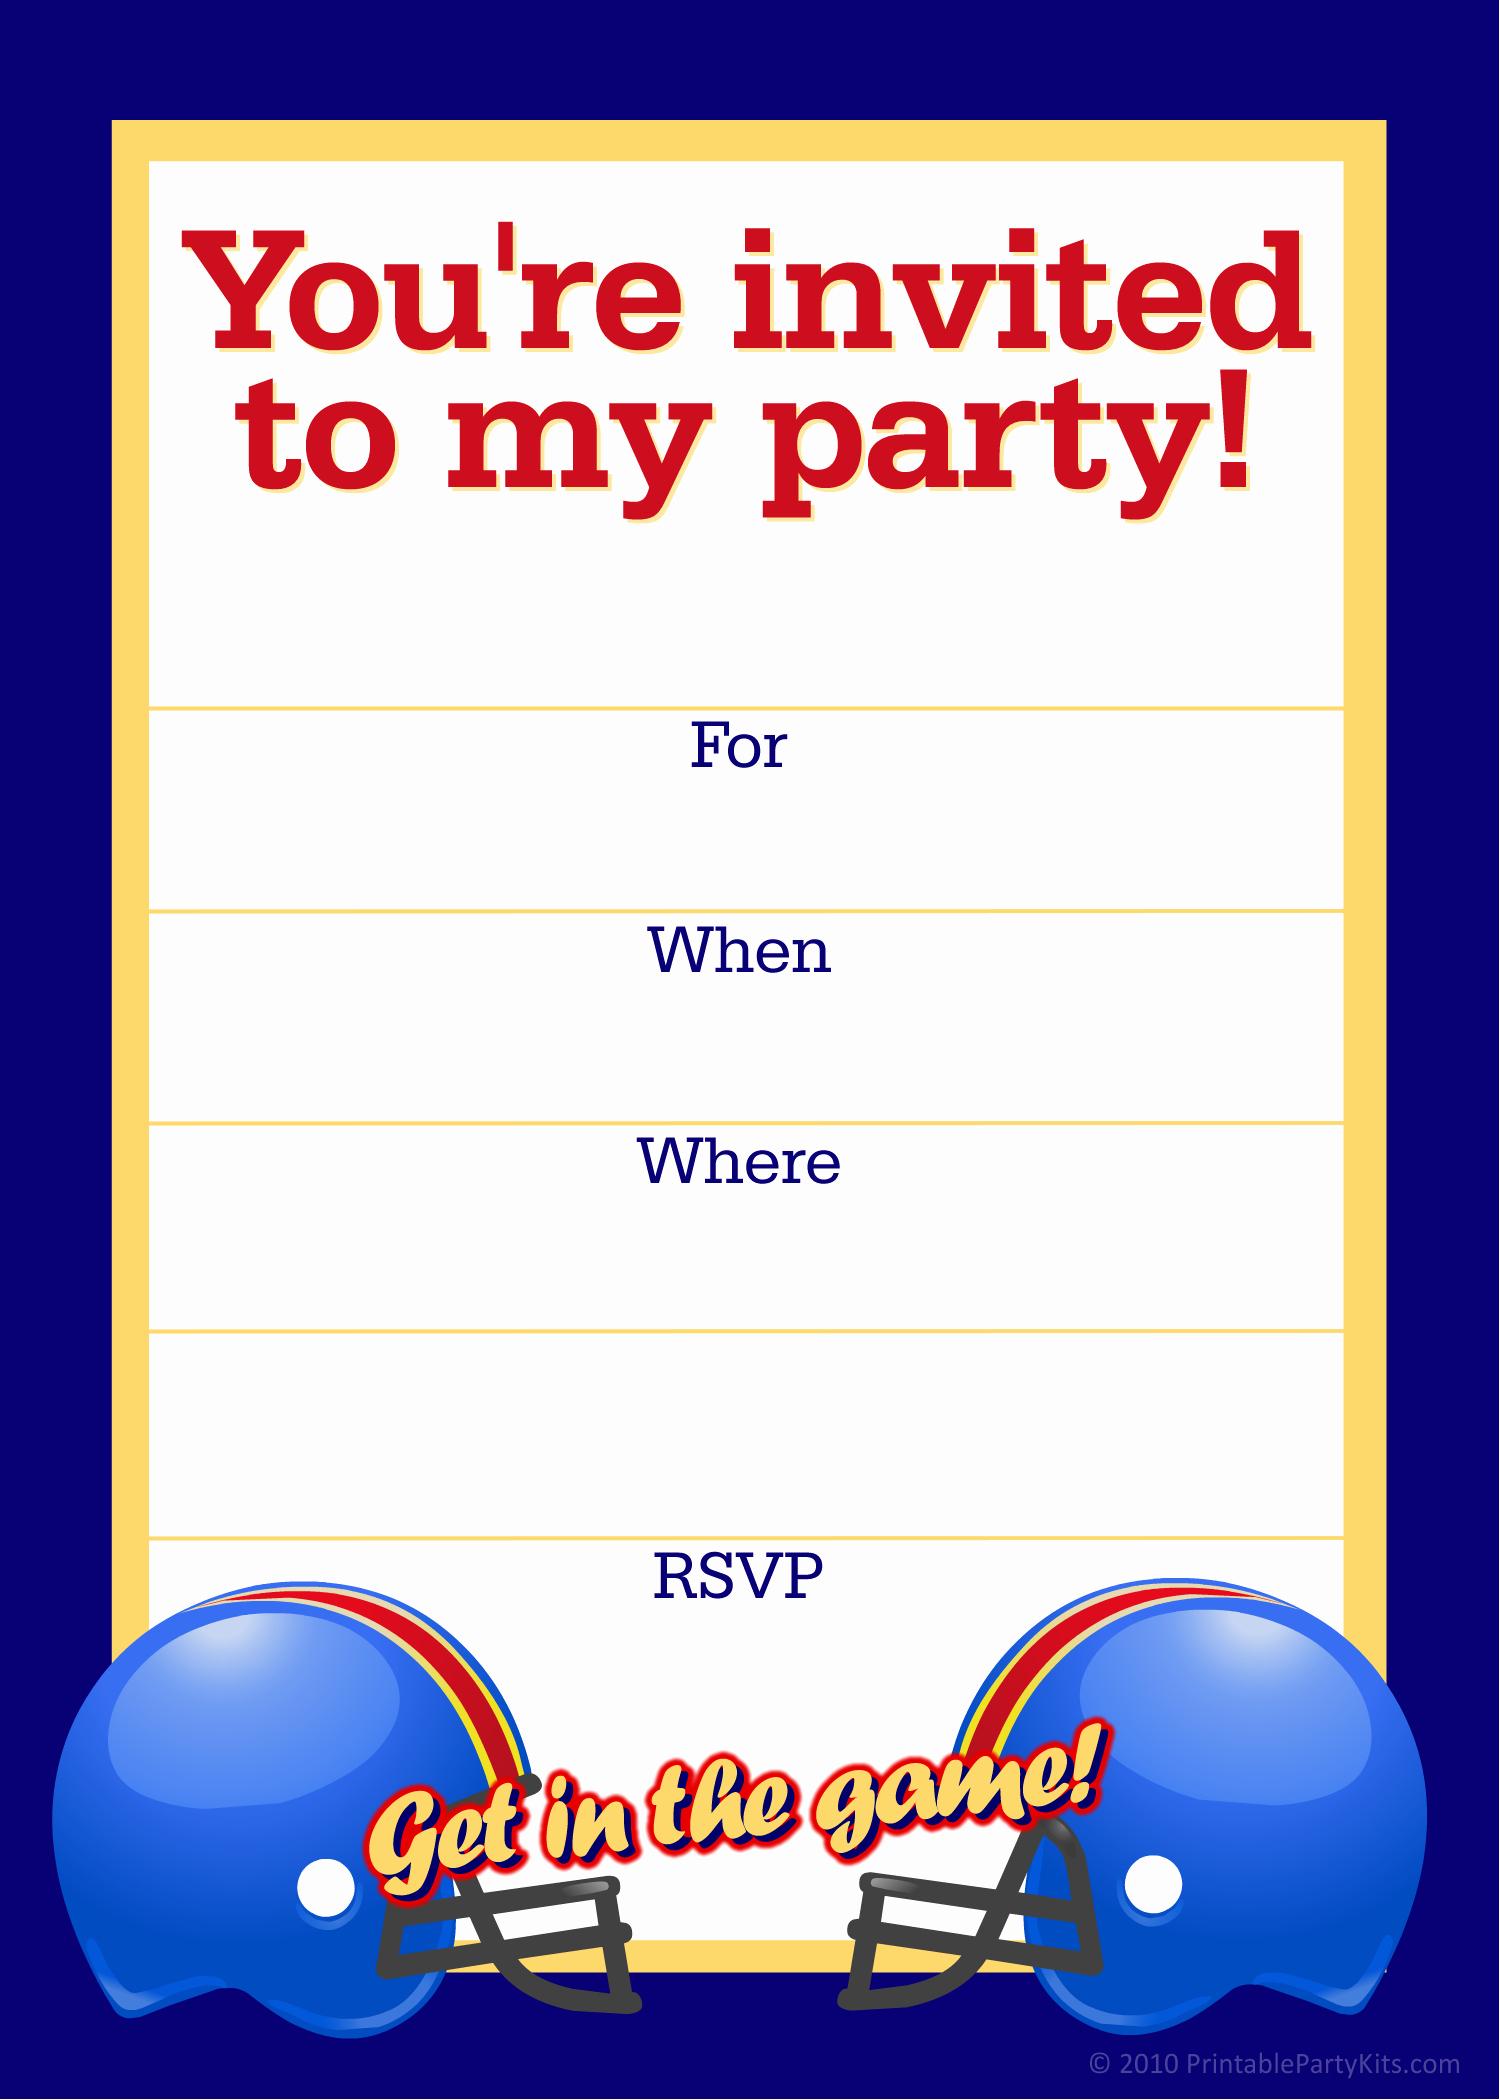 Free Basketball Invitation Templates New Free Printable Sports Birthday Party Invitations Templates